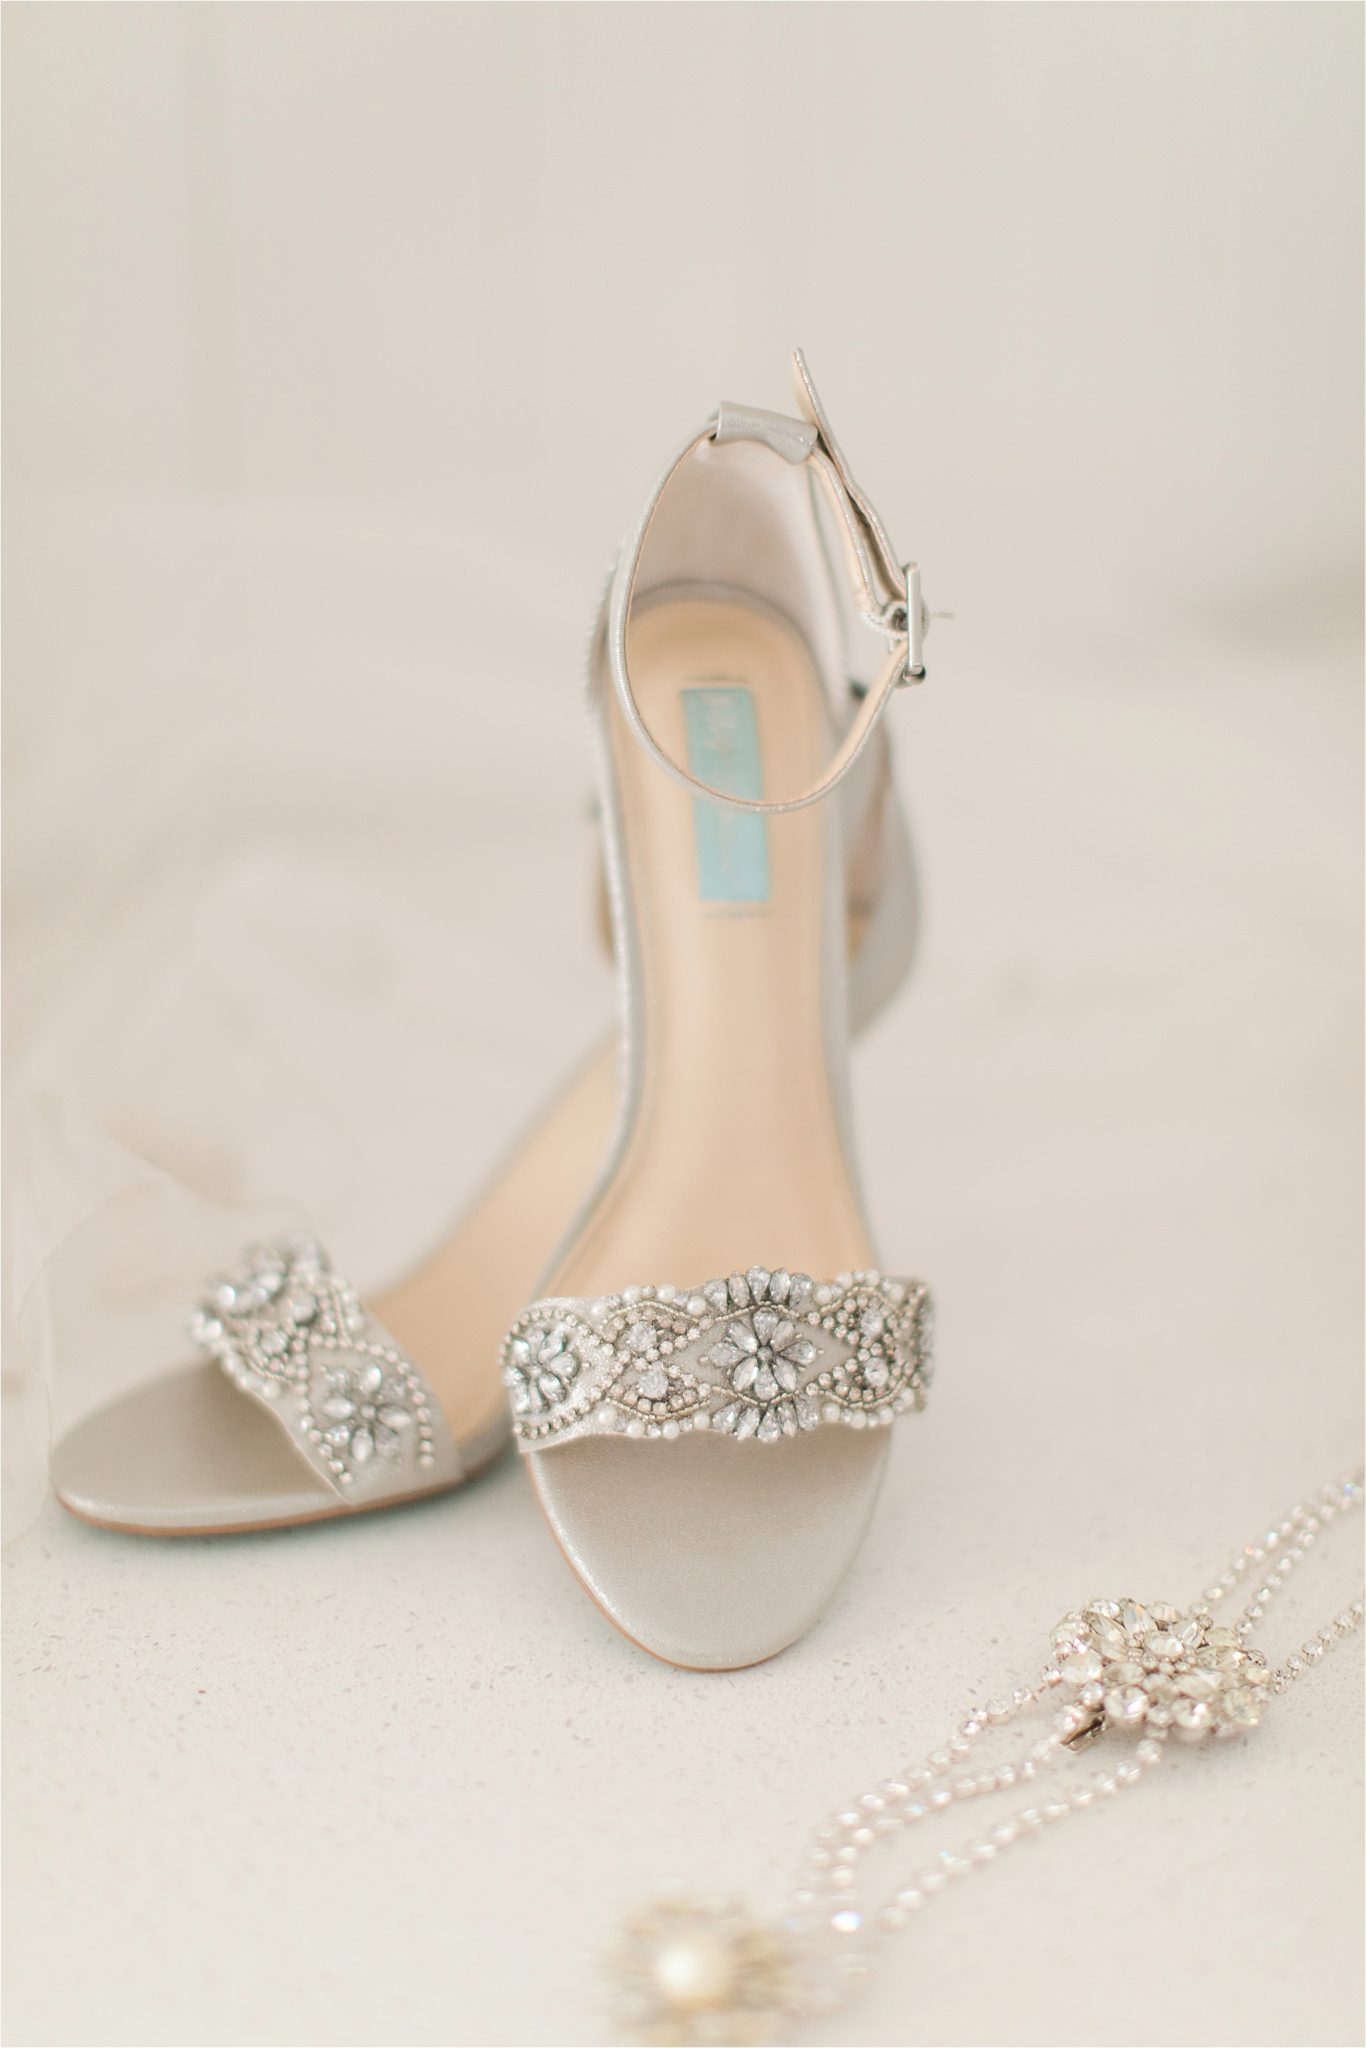 Alabama Wedding Photographer-Little Point Clear Winter Wedding-Meri Beth + Andrew-Wedding Shoes-Wedding Details